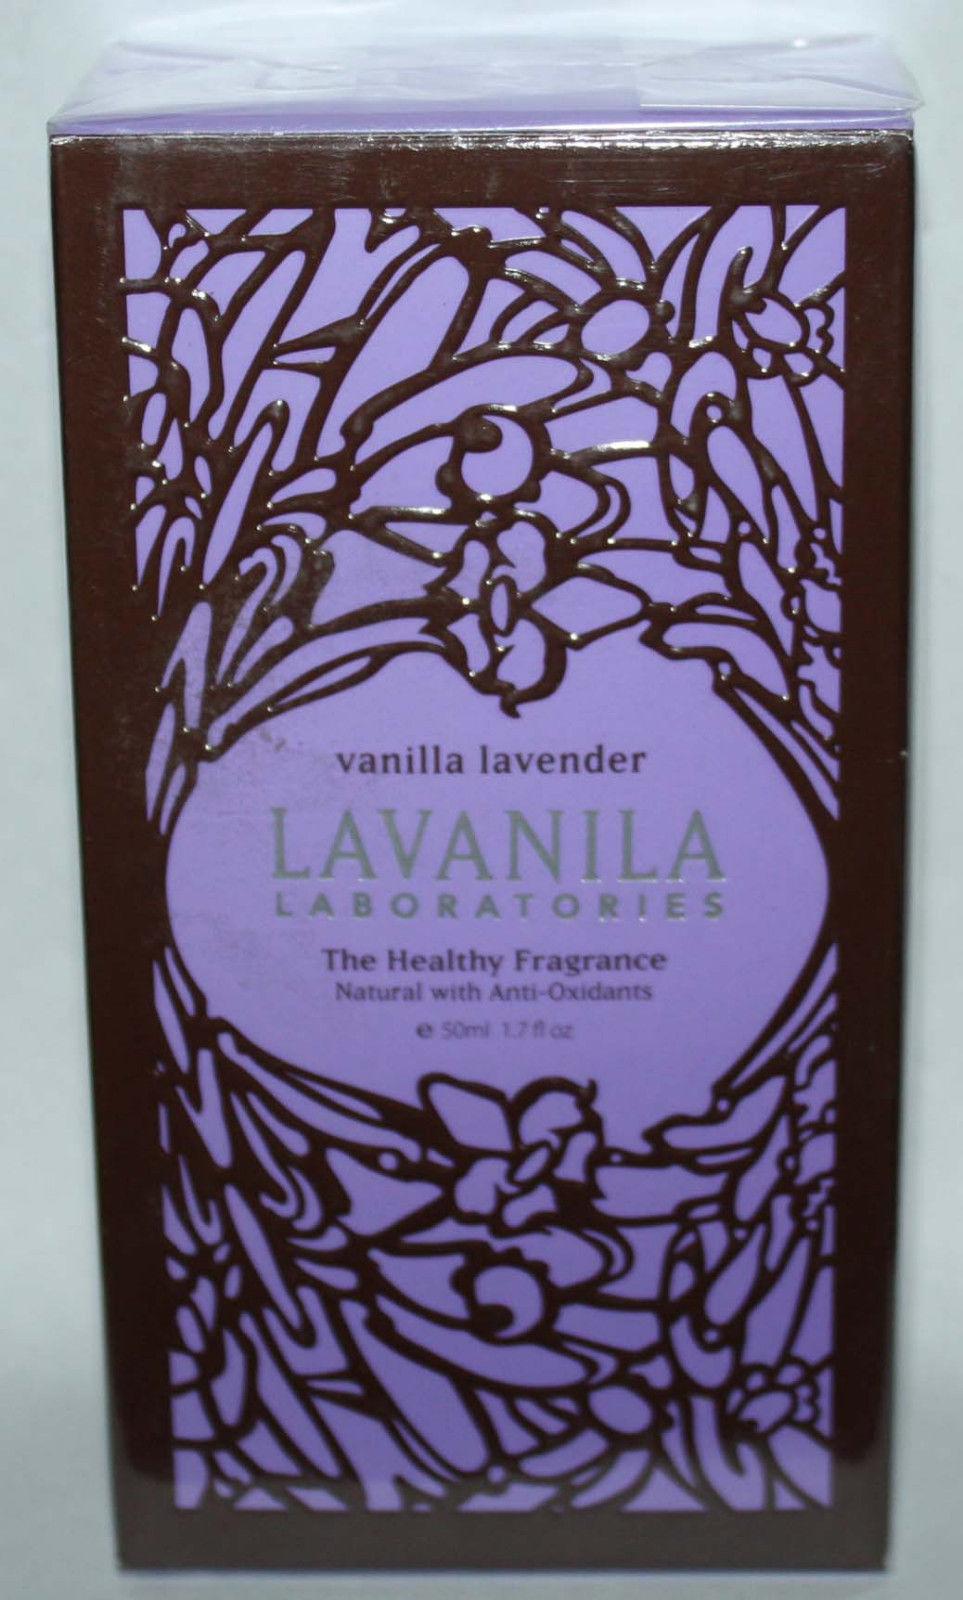 Lavanila The Healthy Fragrance VANILLA LAVENDER 1.7 oz 10859